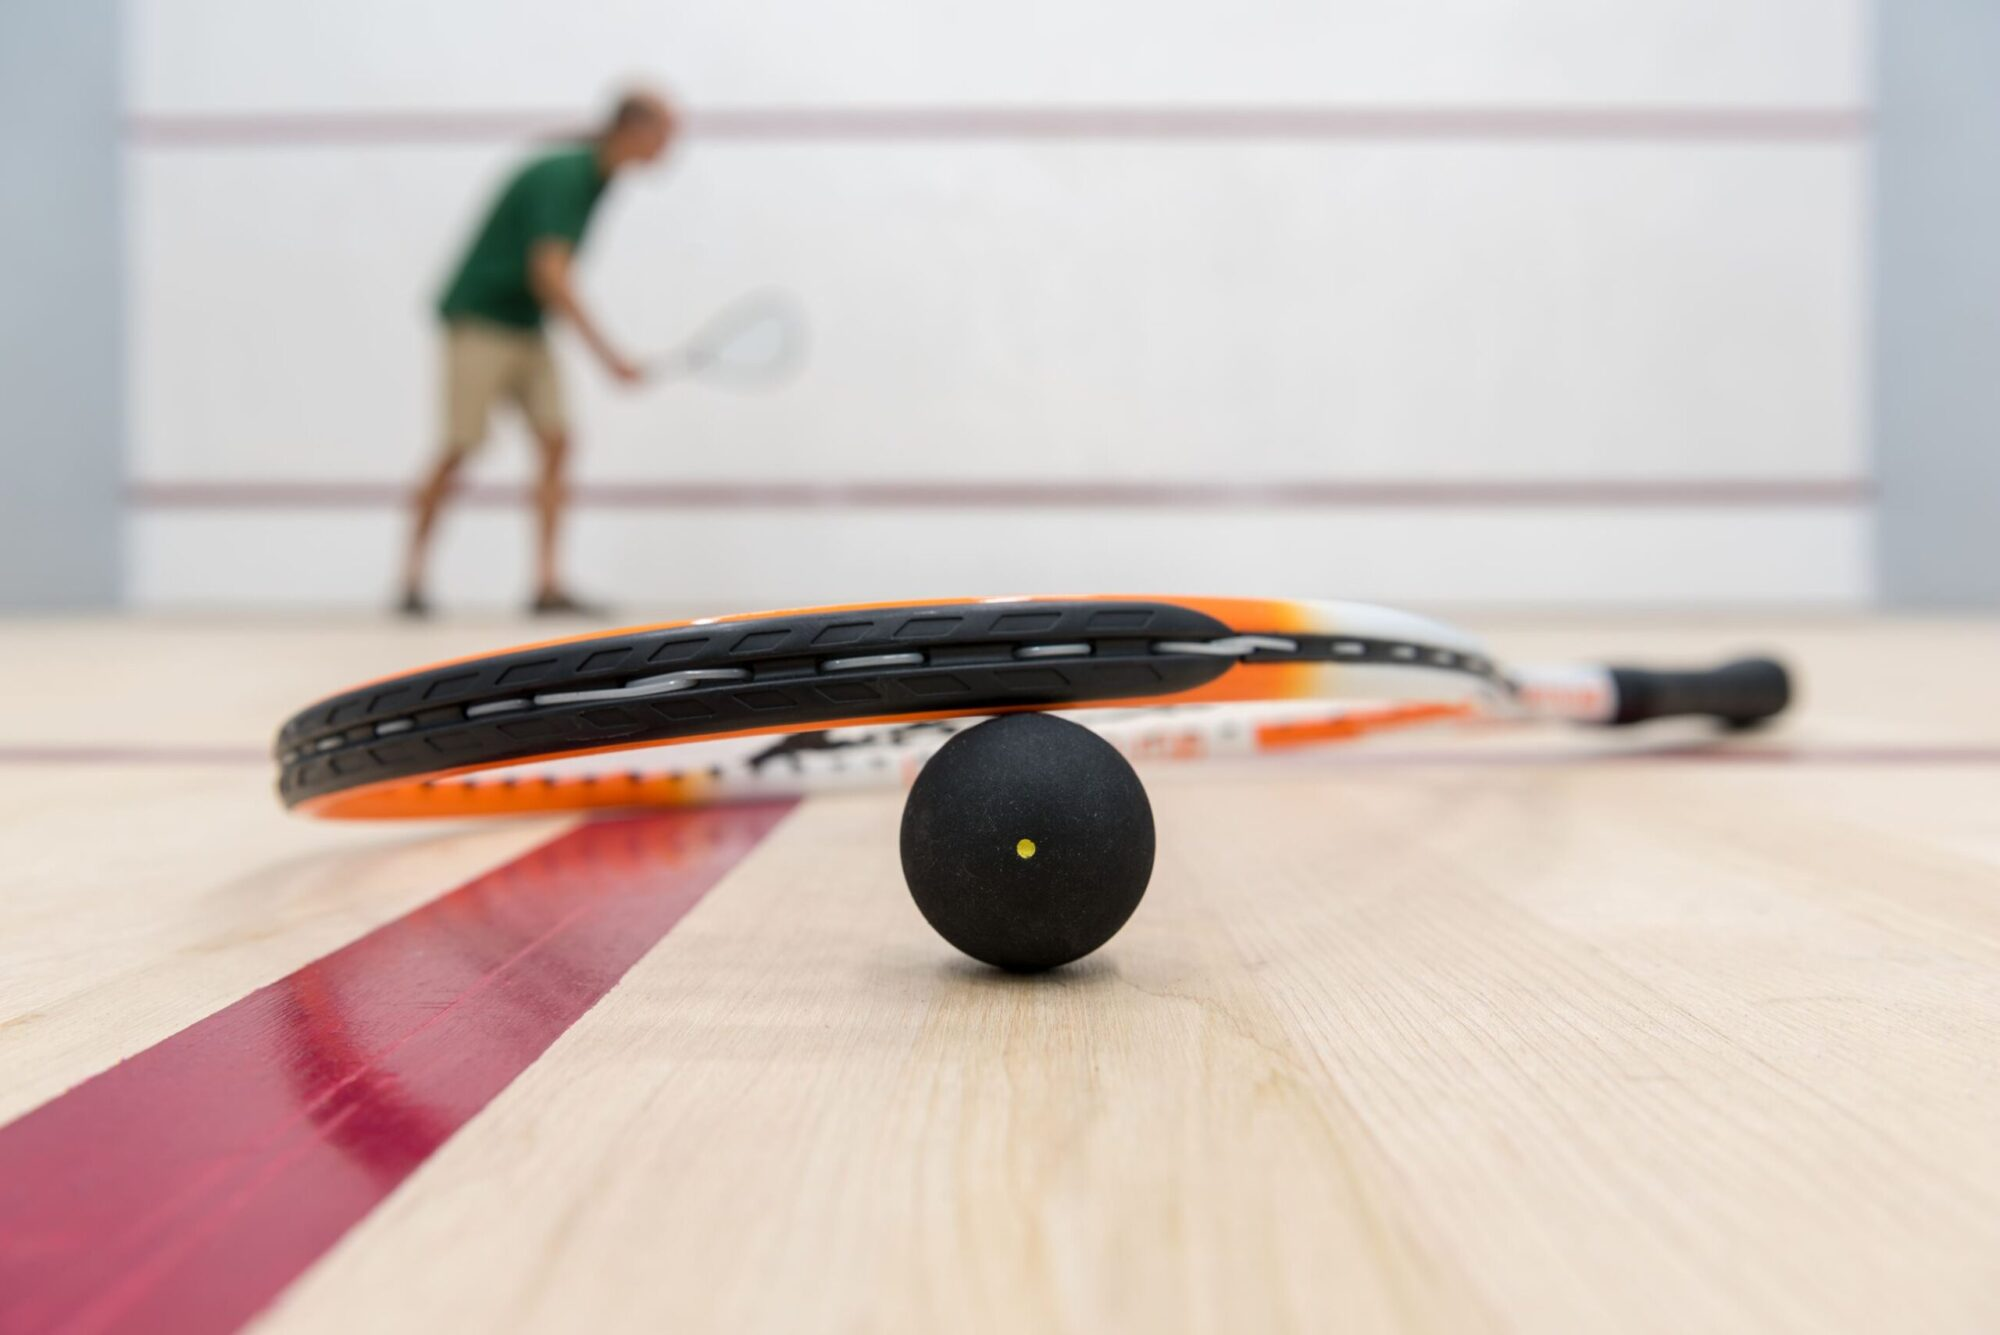 March Squash & Racketball Club